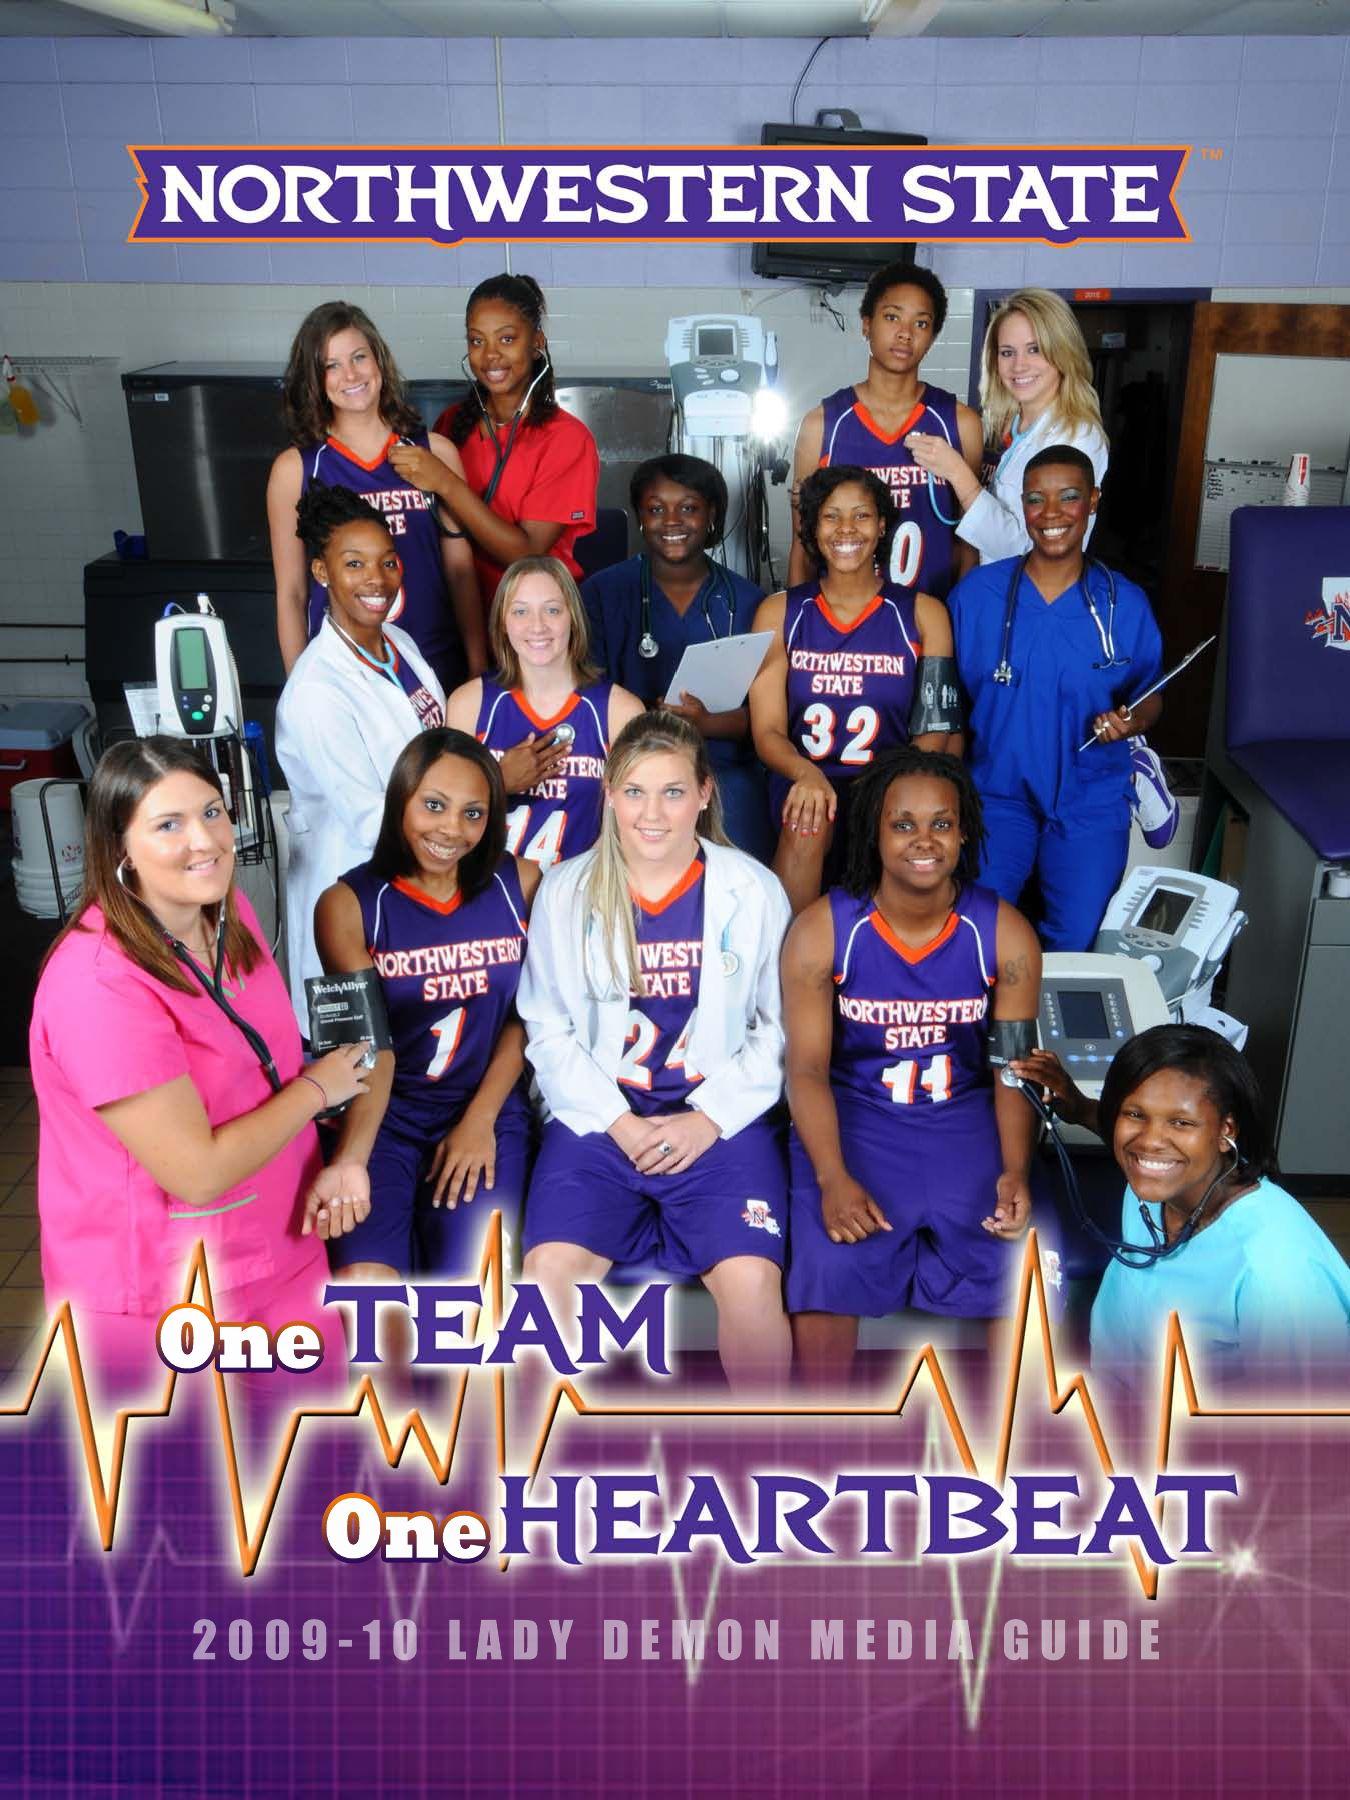 NBA, WNBA, Toyota, Times Square Go Purple for Spirit Day